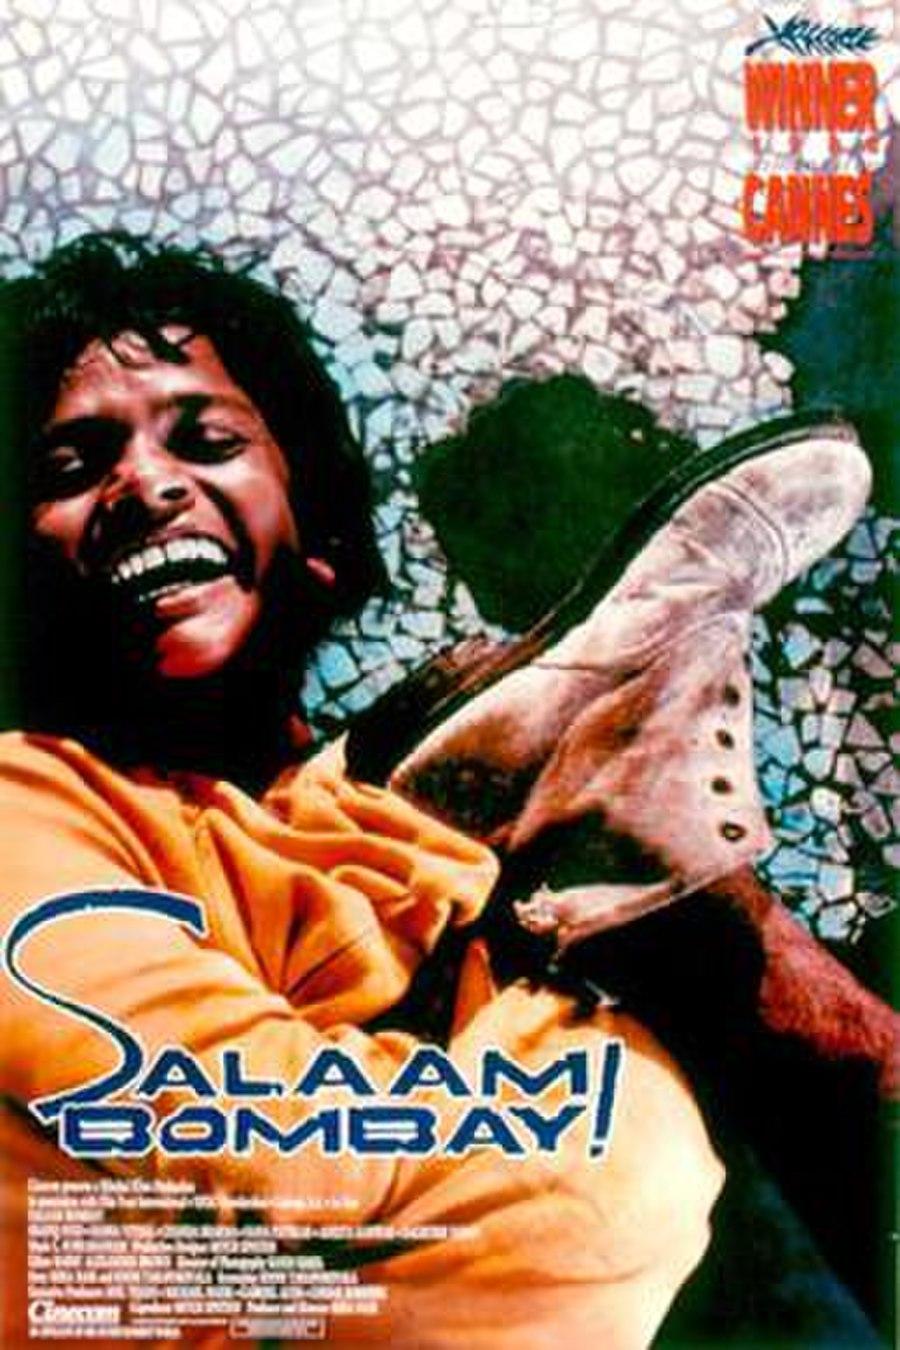 Salaam Bombay! Hindi: सलाम बॉम्बे